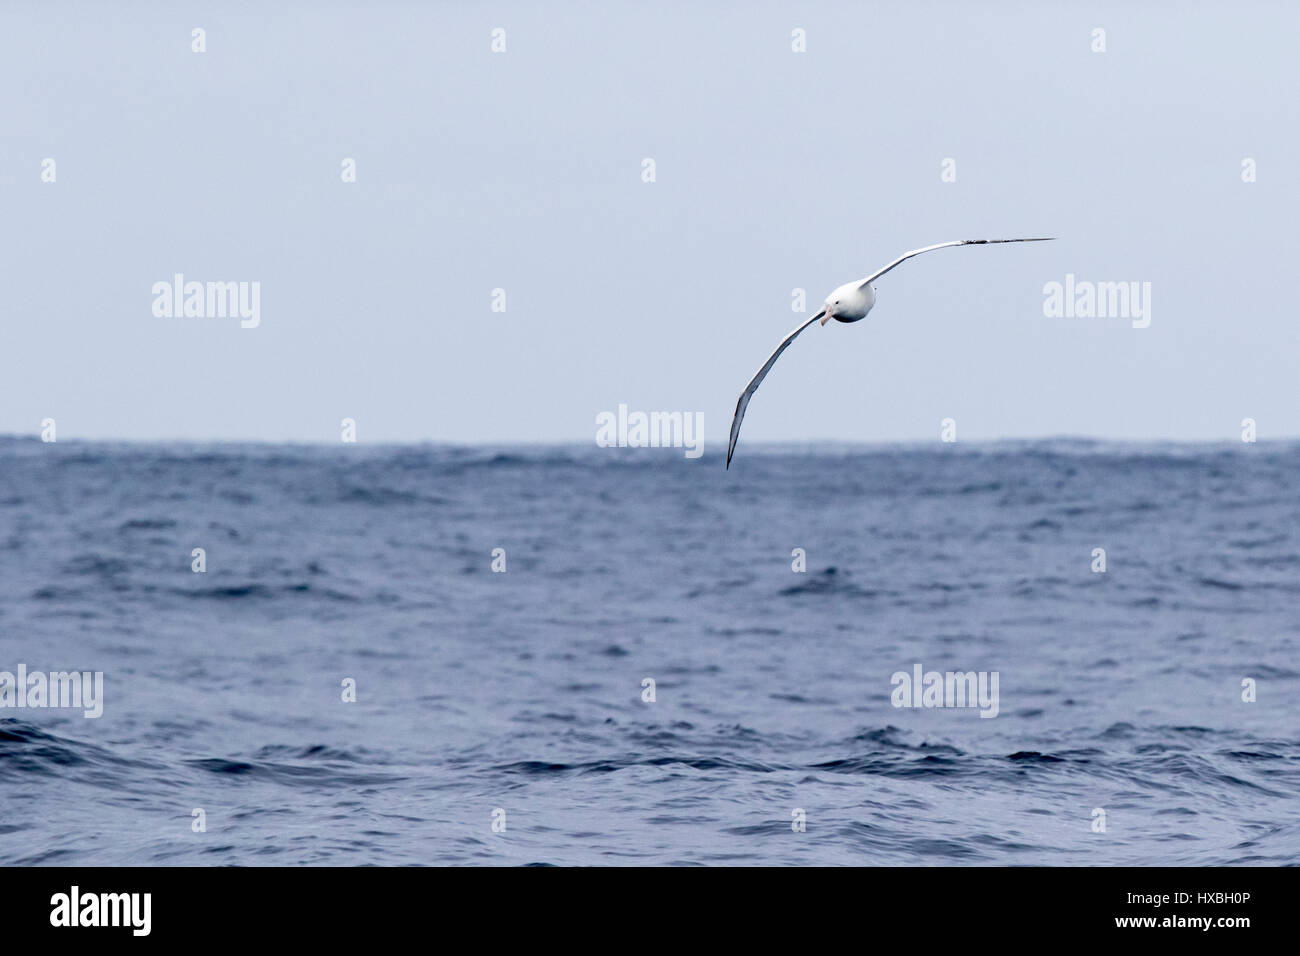 Albatross soars above the Drake Passage. - Stock Image